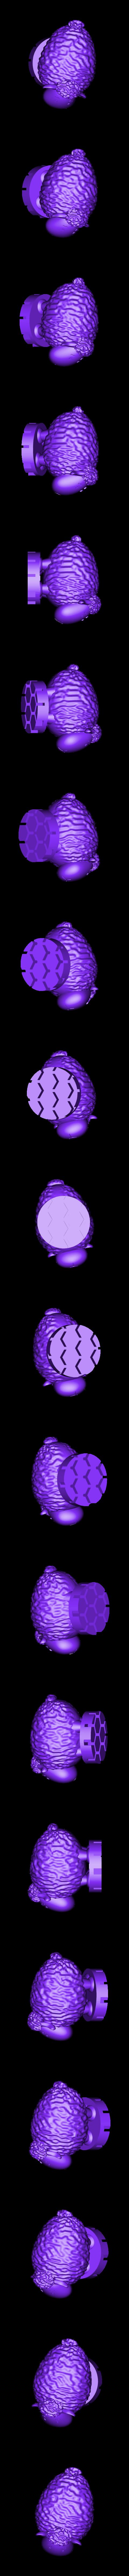 Zoetrope_Prusament Spool_by Dominik Cisar_Sheep 07.stl Download free STL file SPIROGRAPH - PRUSAMENT SPOOL - reuse idea • 3D print model, cisardom